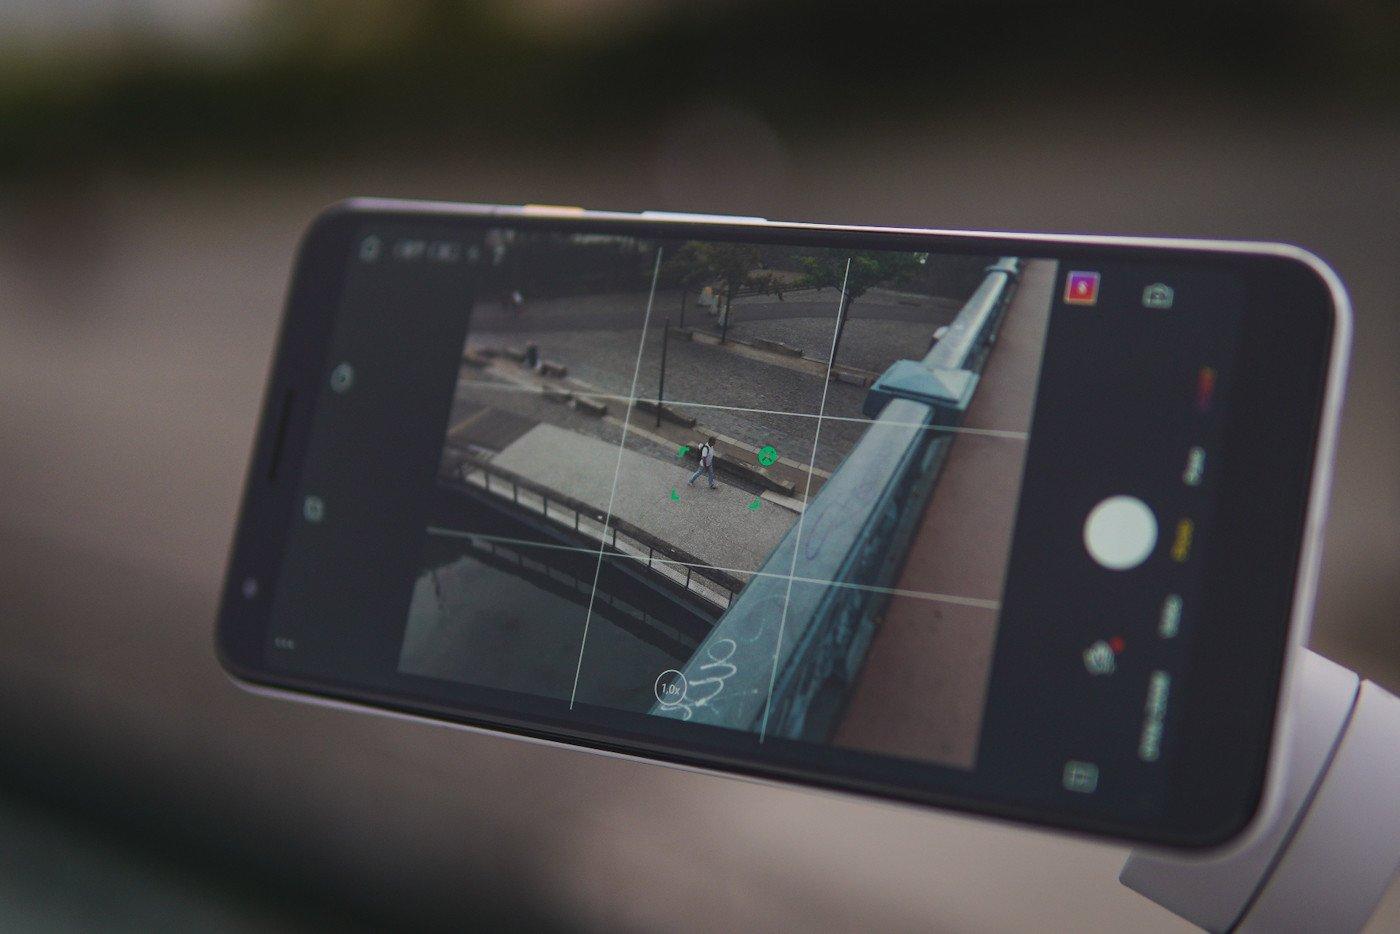 DJI Osmo Mobile 4 ActiveTrack